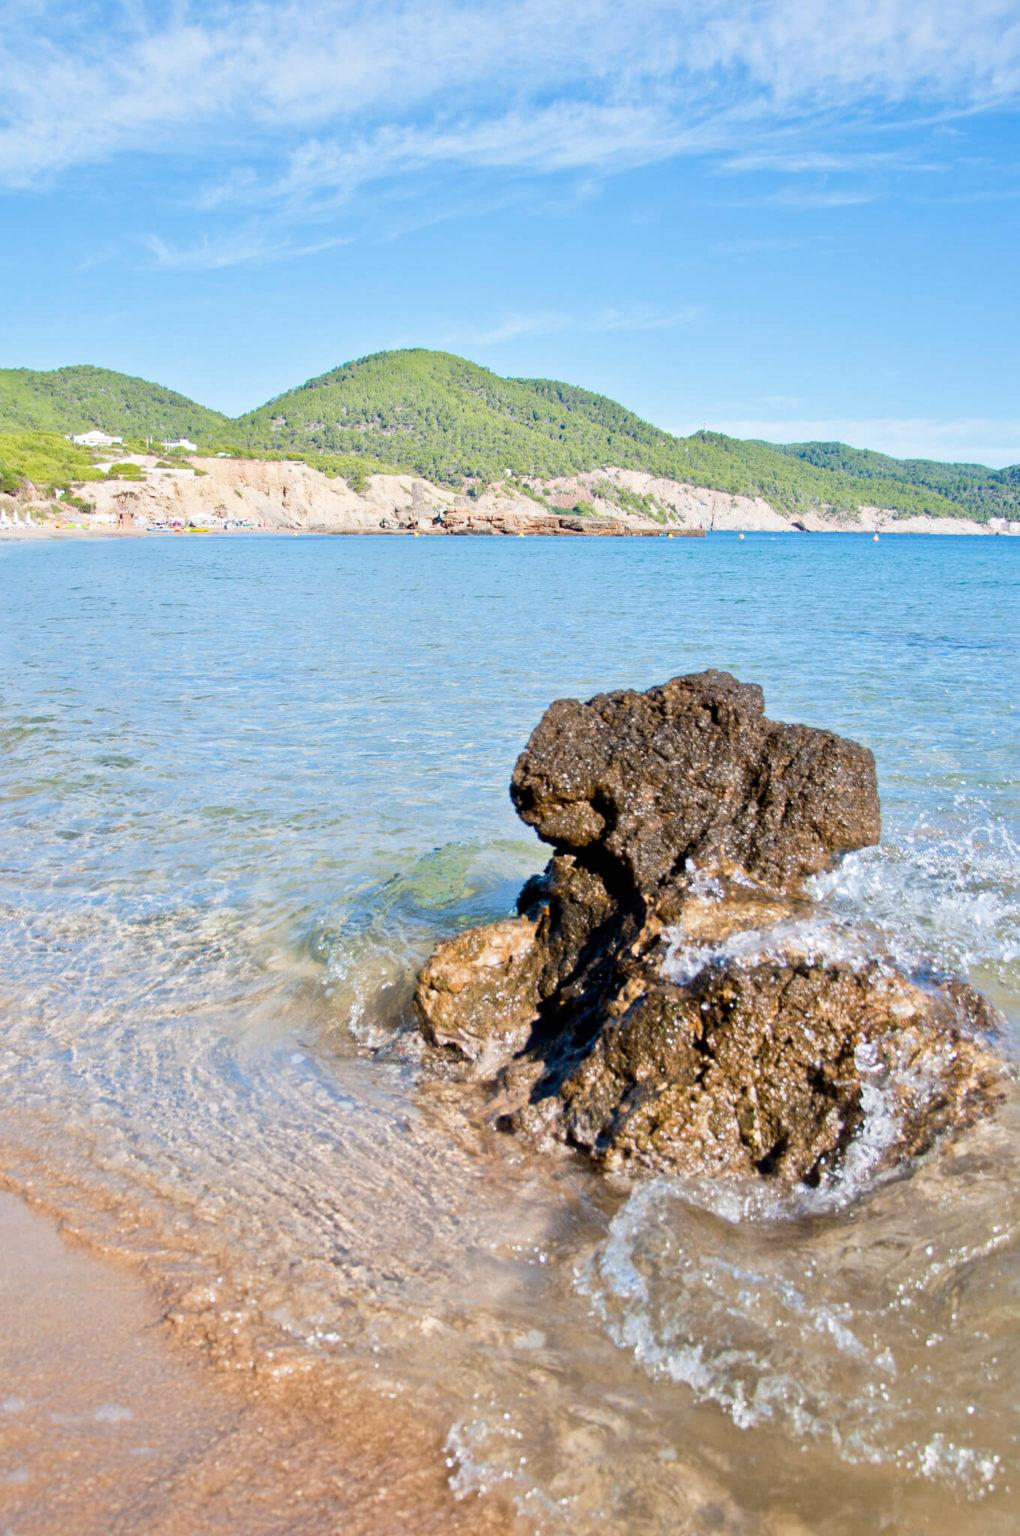 https://www.white-ibiza.com/wp-content/uploads/2020/03/ibiza-beaches-es-figueral-05-1020x1536.jpg